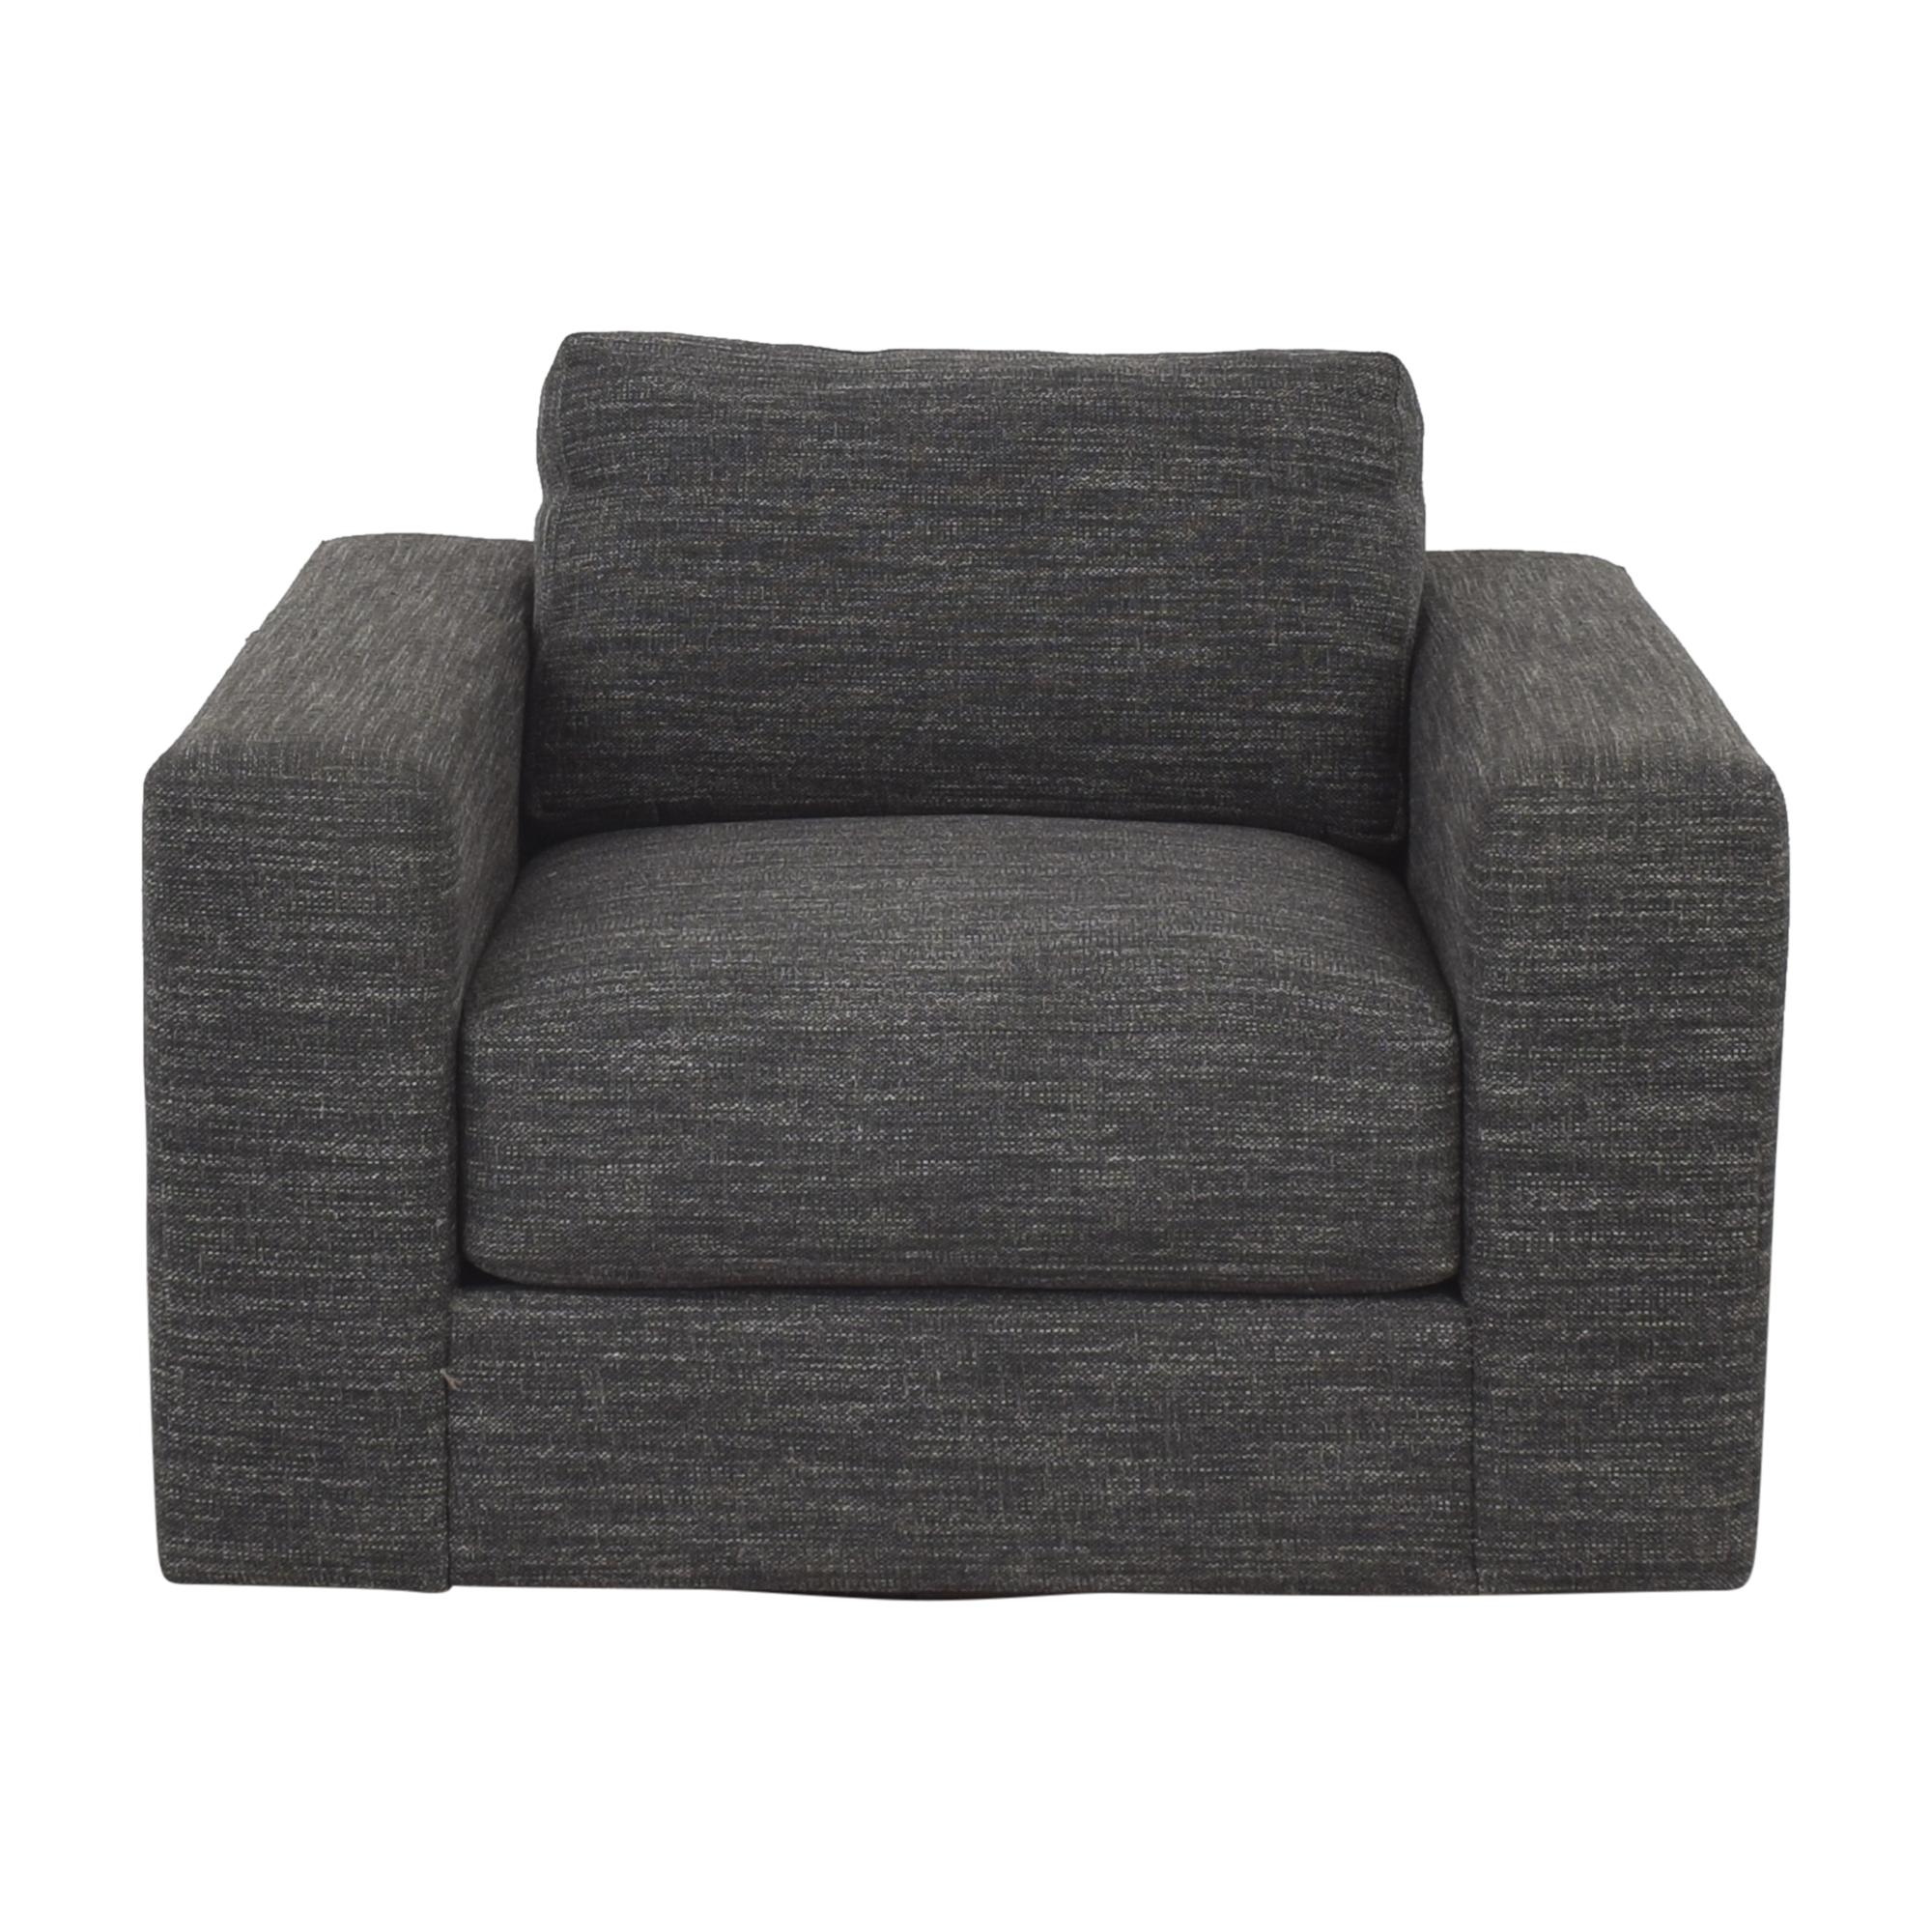 West Elm West Elm Urban Swivel Chair dark gray